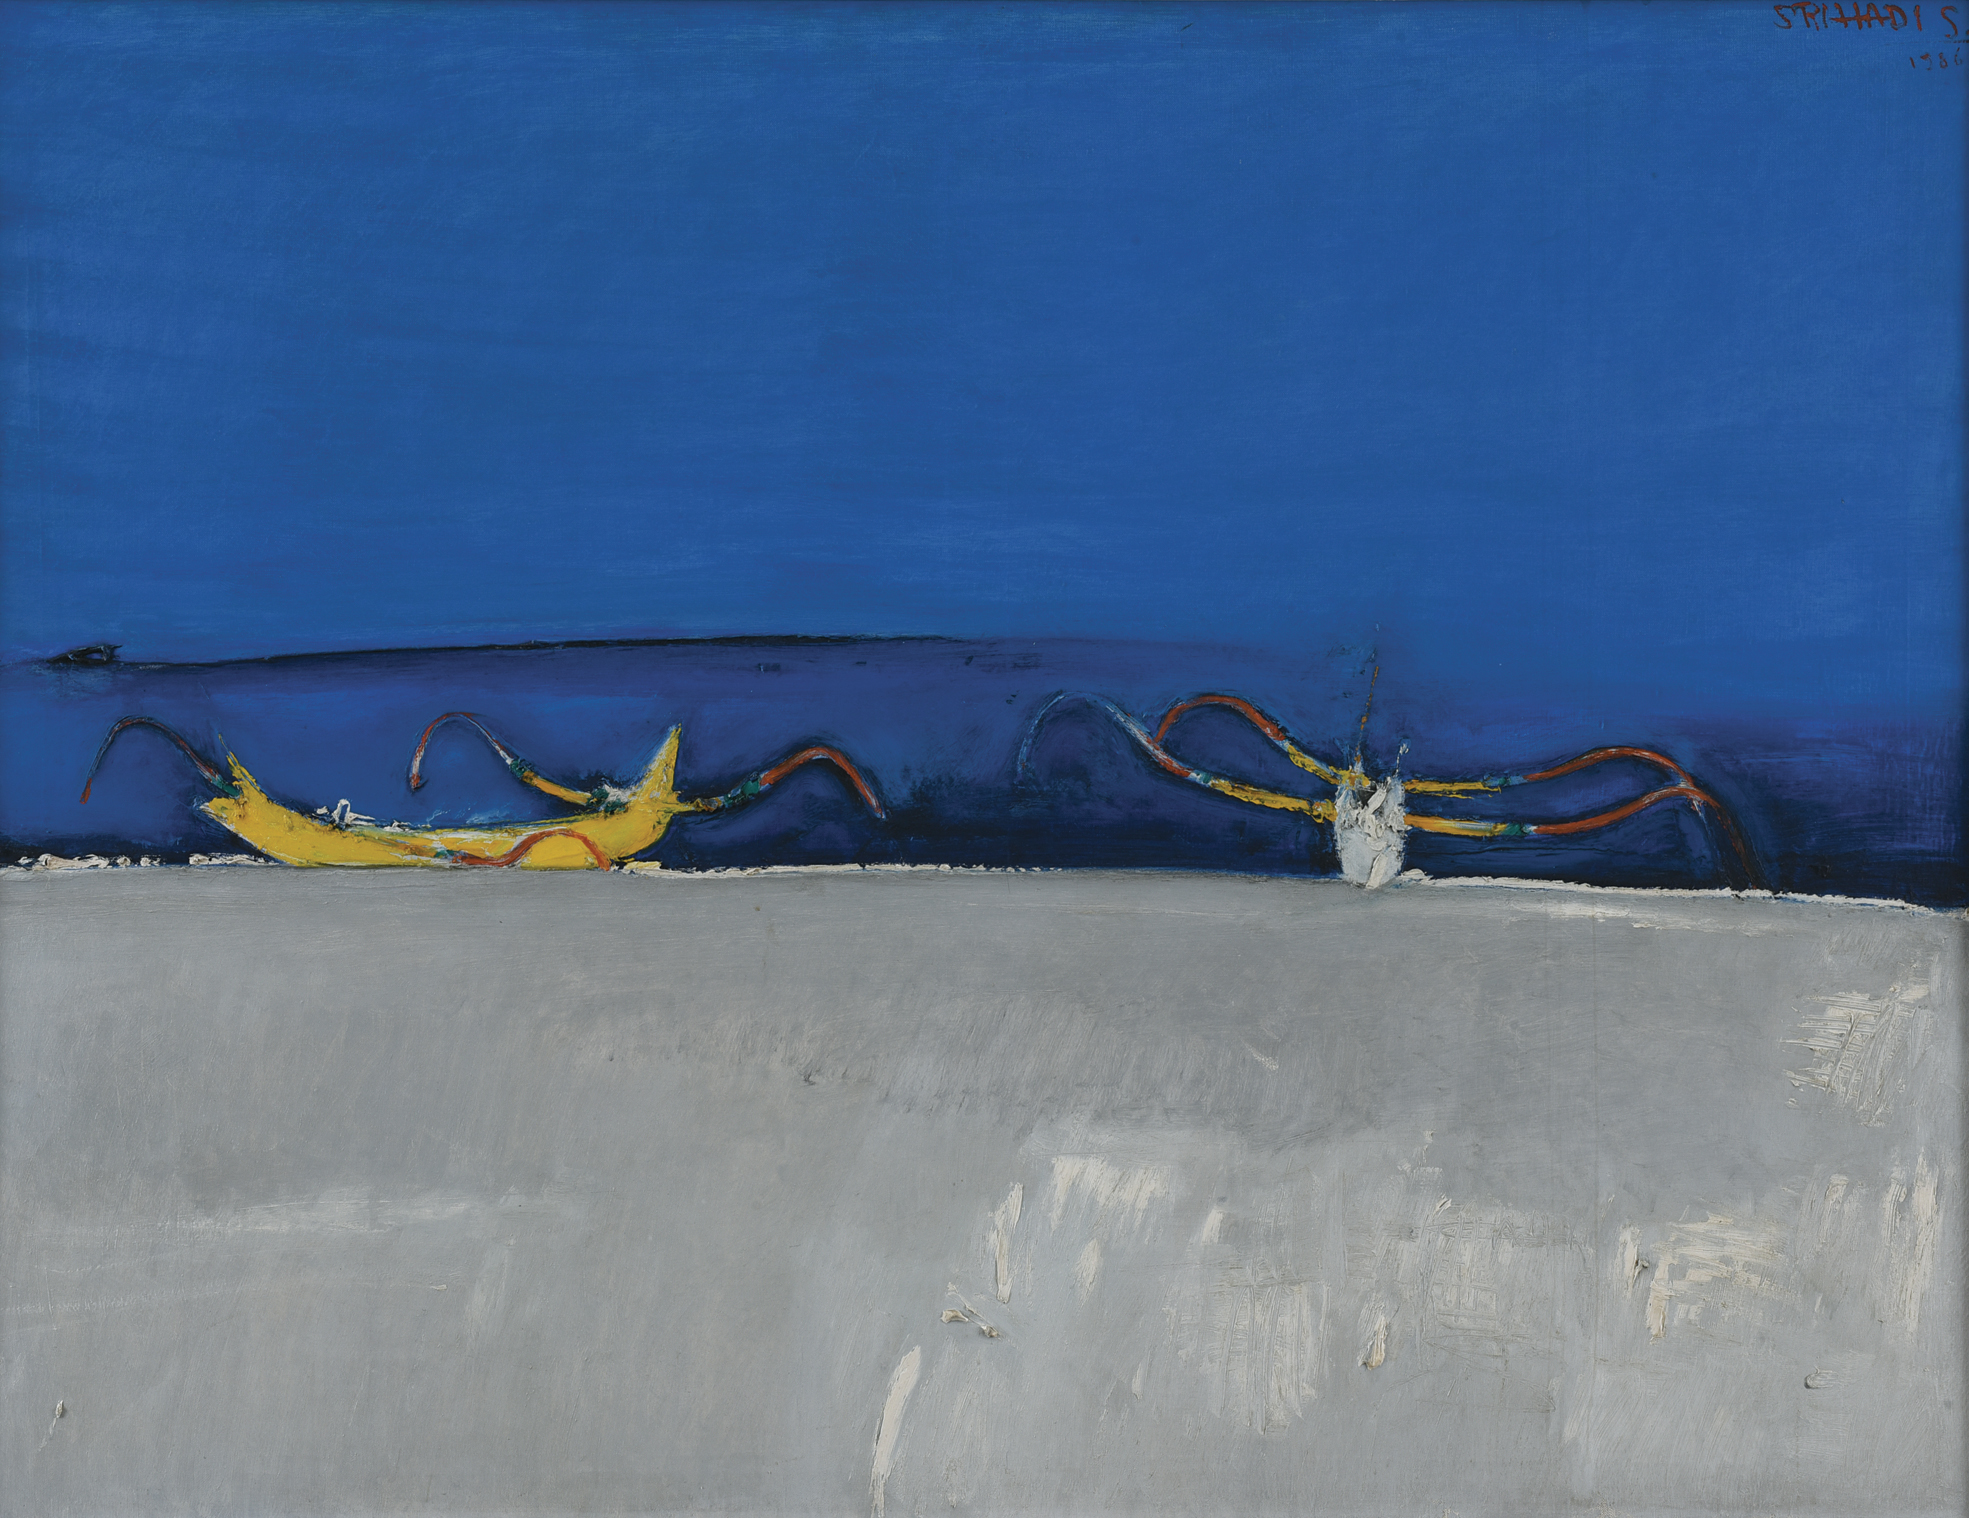 Srihadi Soedarsono, Horizon and the Fishing Boats, 1986, 100 x 130 cm